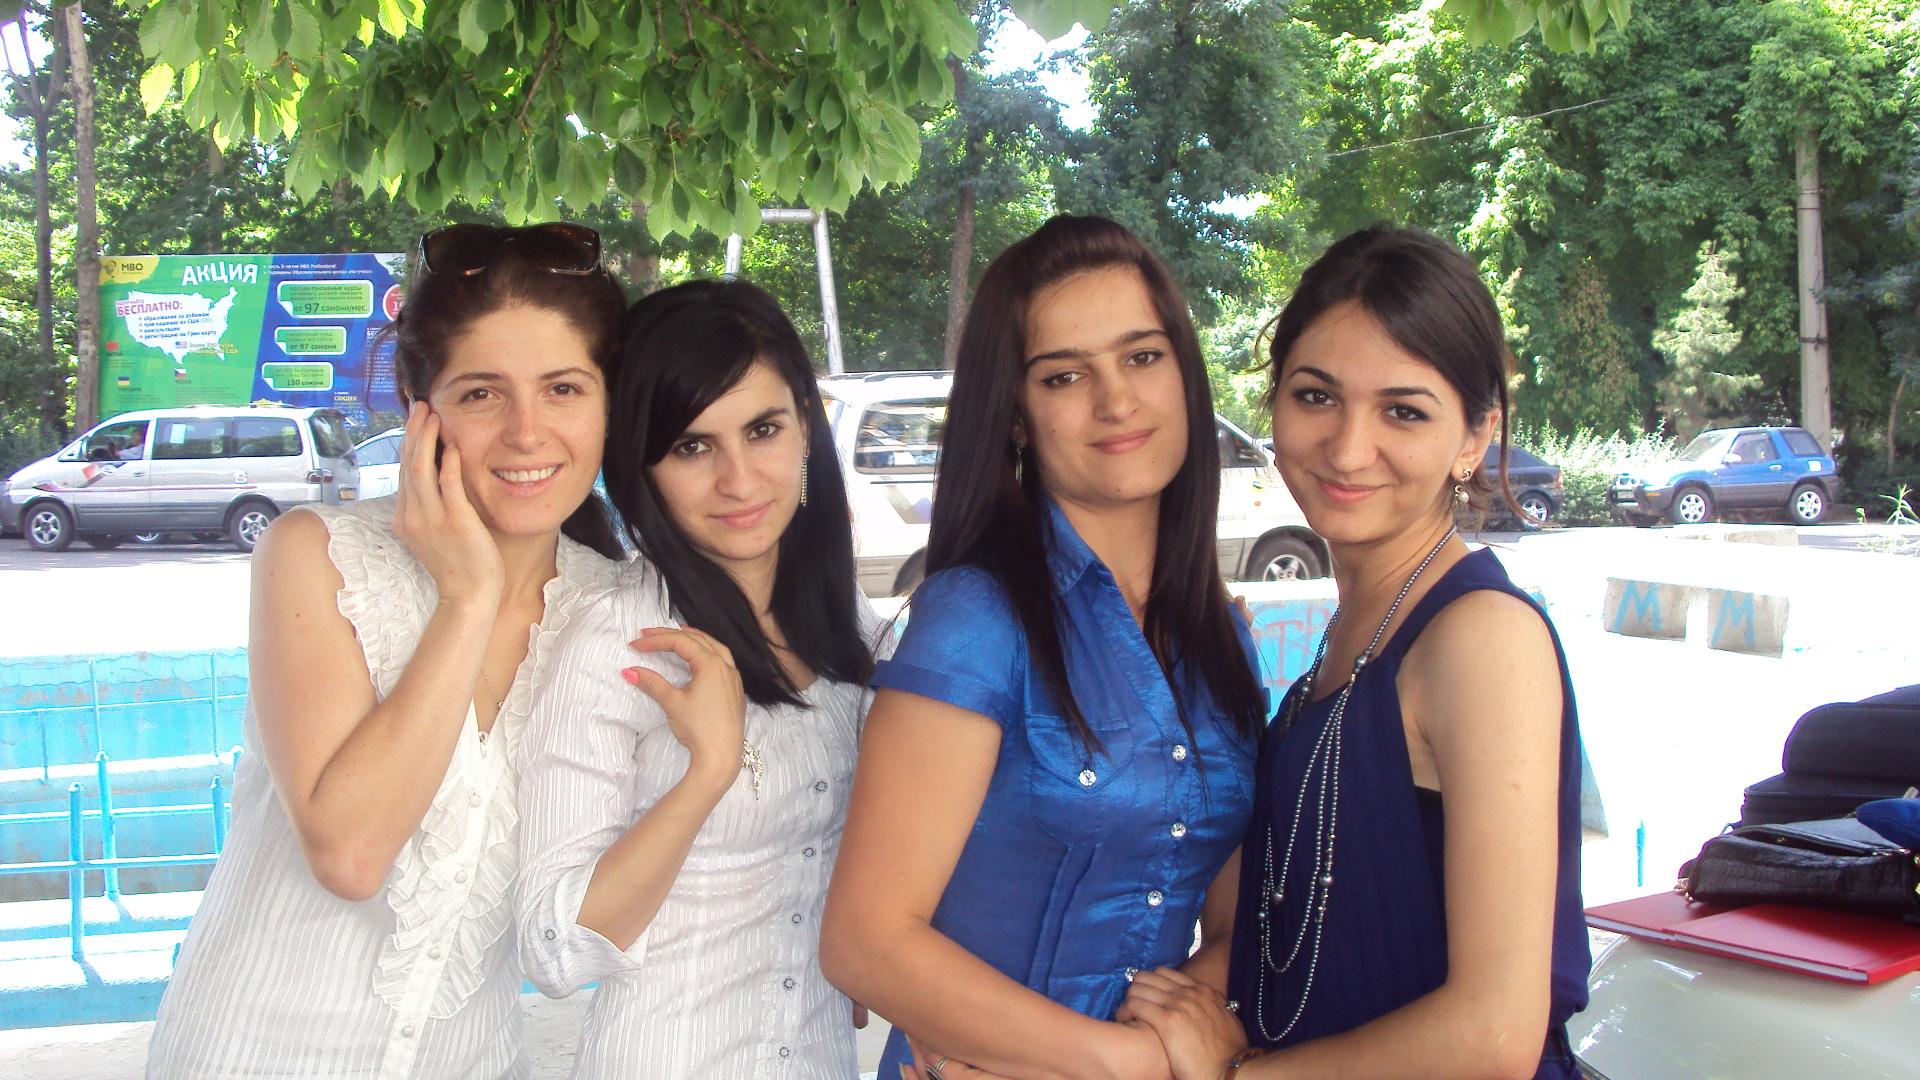 Фото таджикски девушка 3 фотография